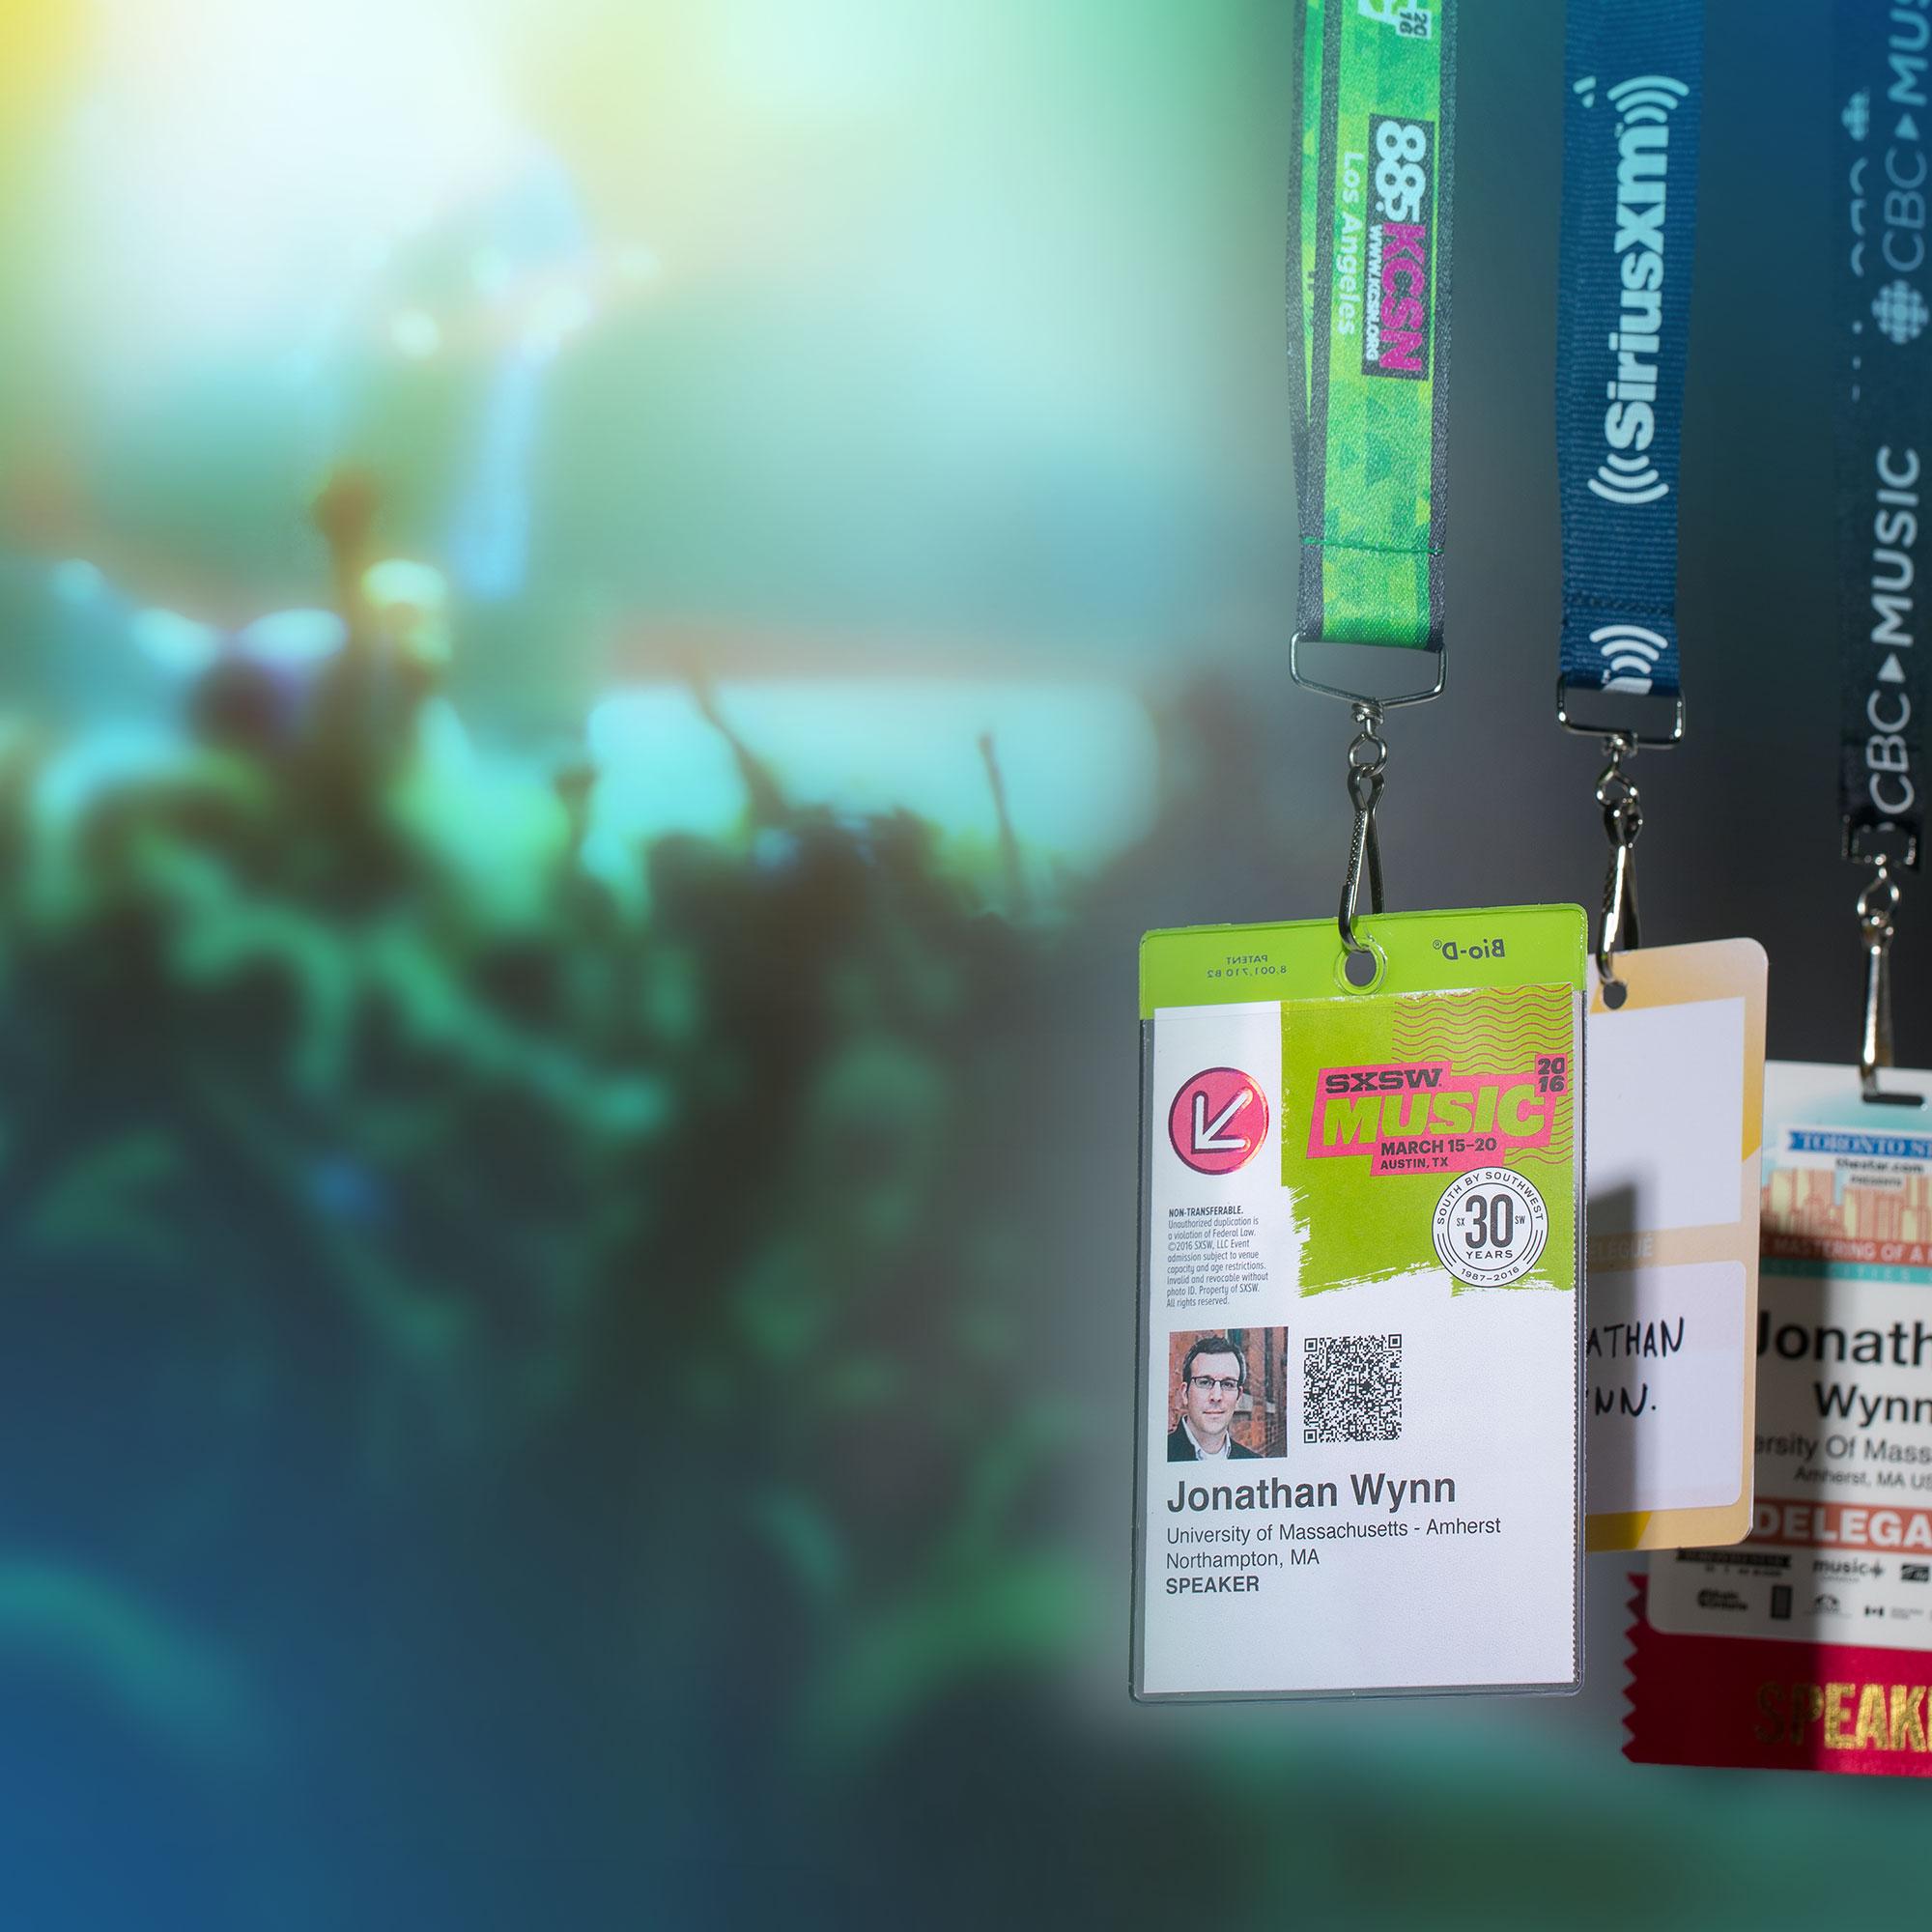 Jonathan Wynn's festival passes